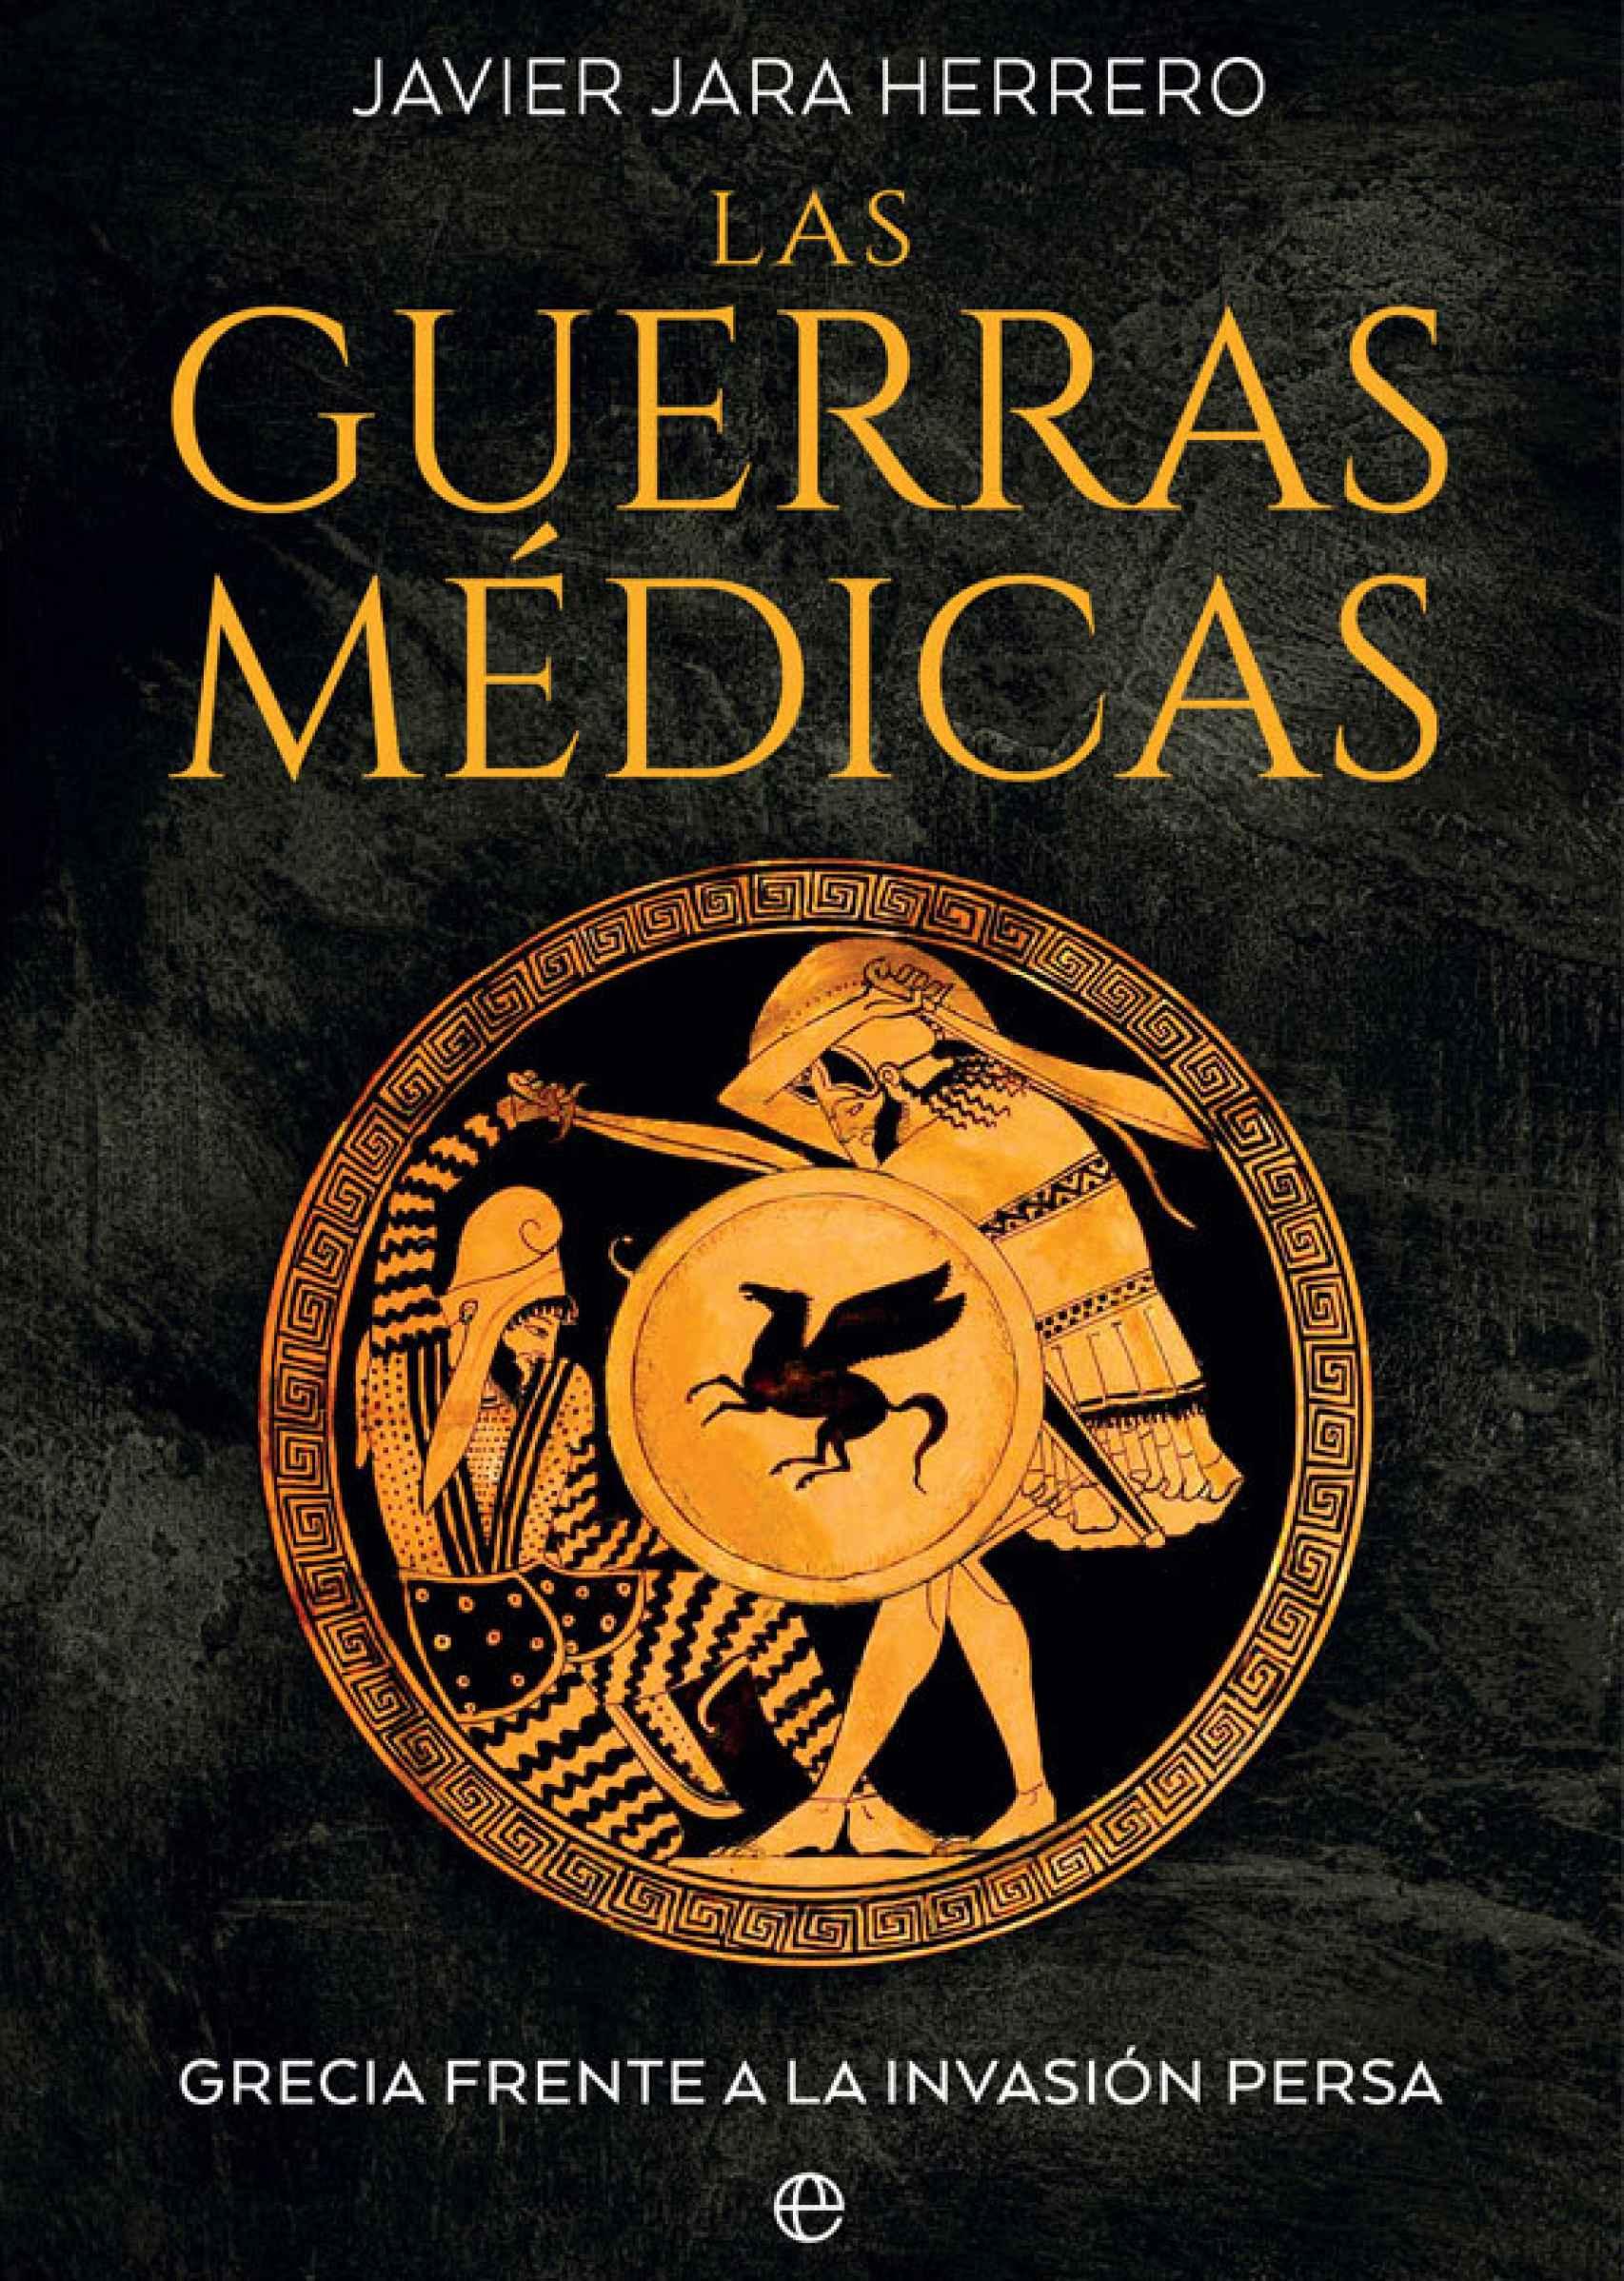 Portada de 'Las guerras médicas'.